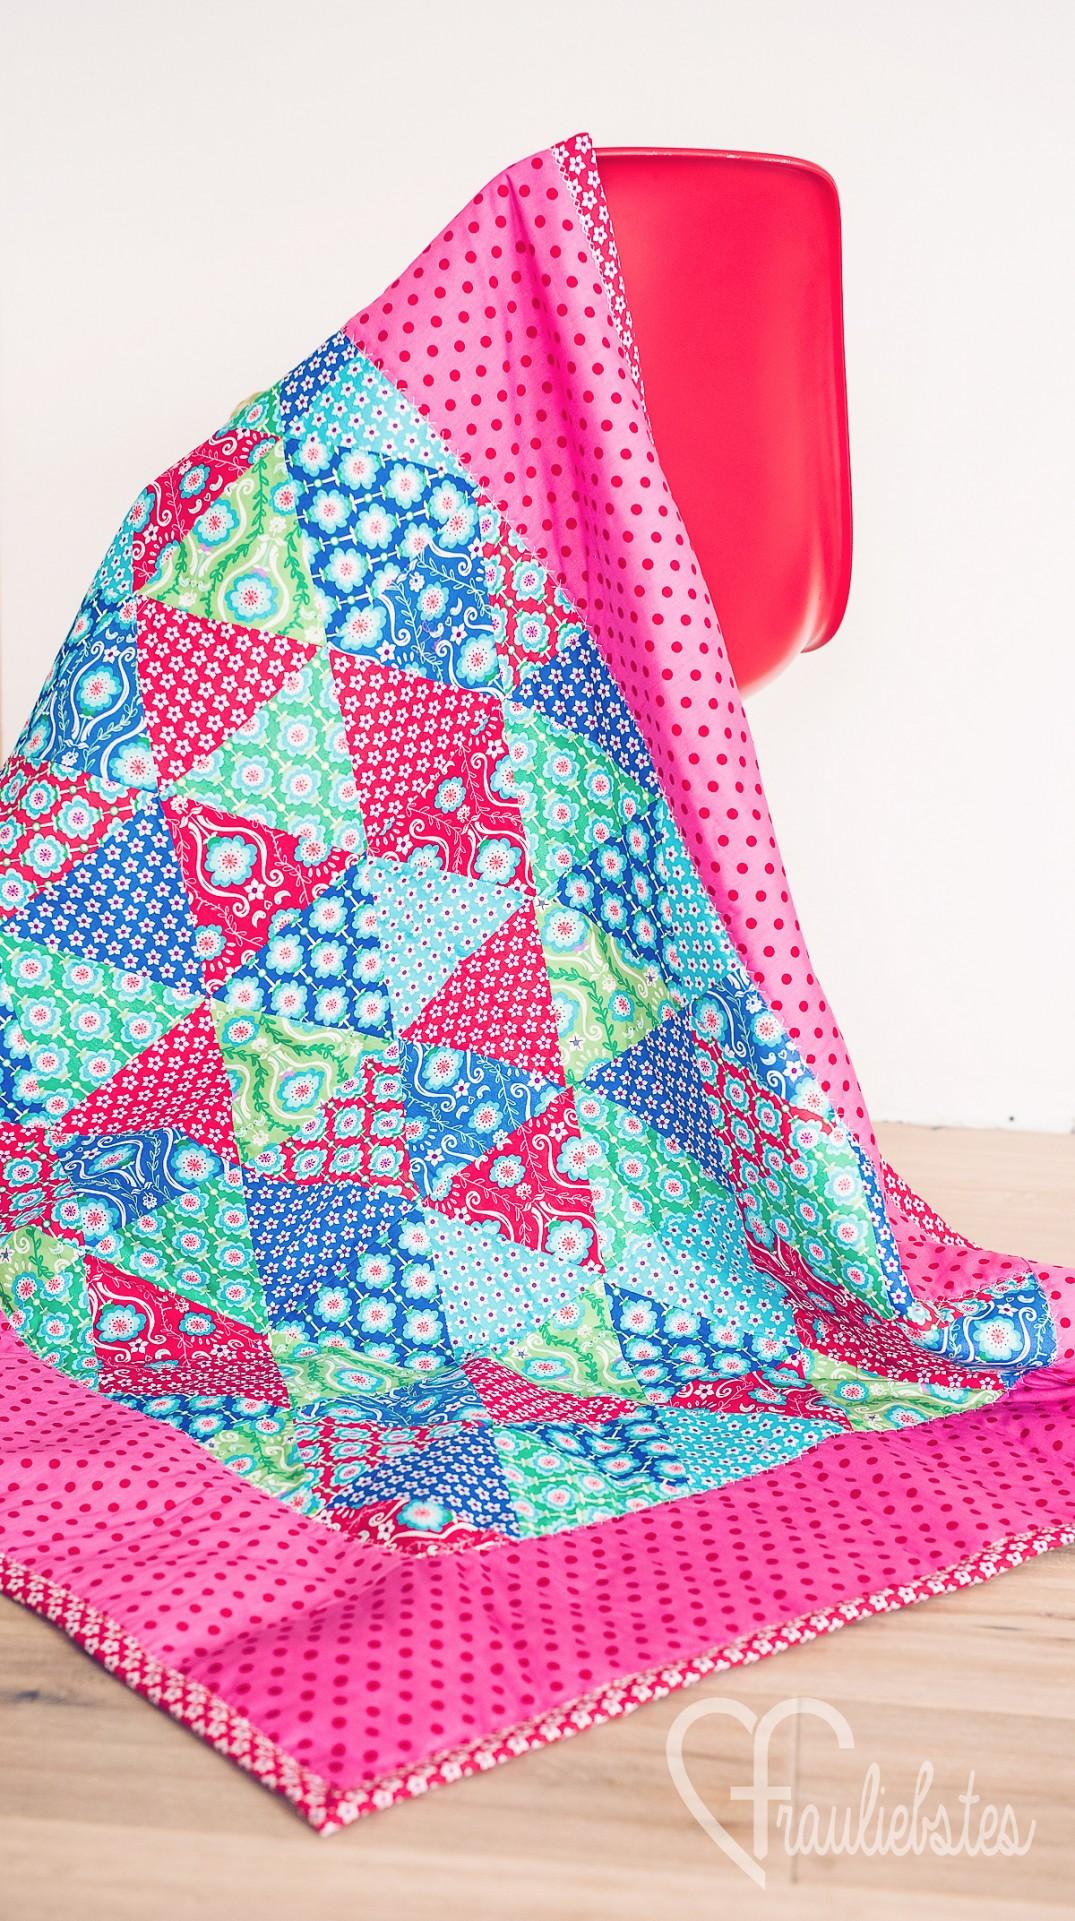 sommerkollektion 2015 jolijou patchwork schultüte frau liebstes-1